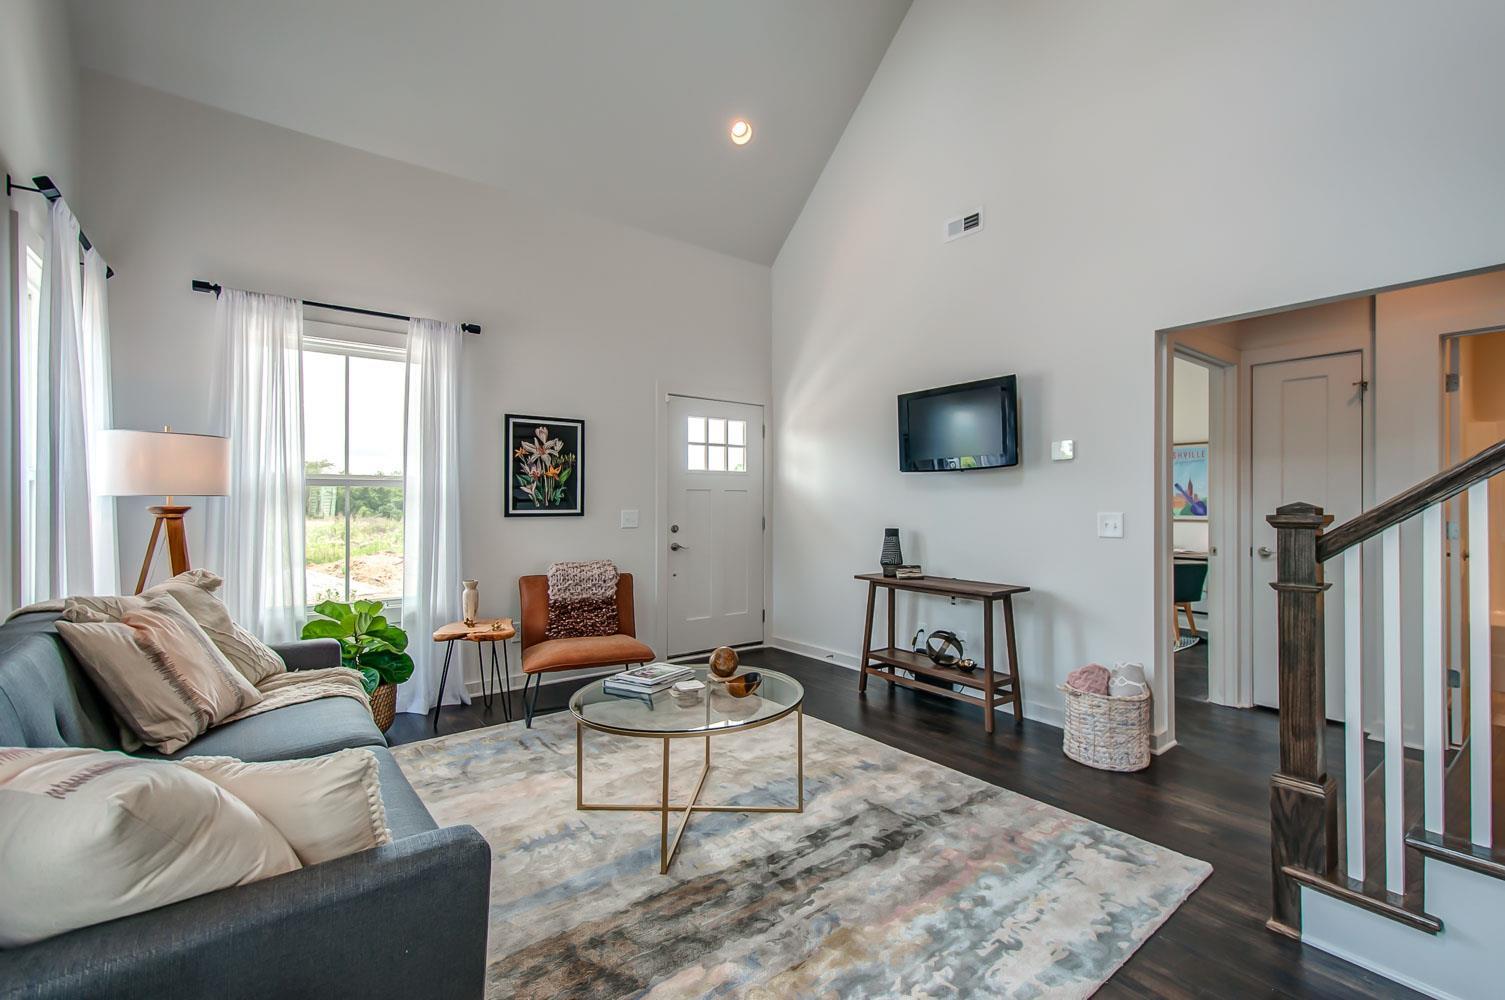 973 Ashland Place Dr, Nashville, TN 37218 - Nashville, TN real estate listing